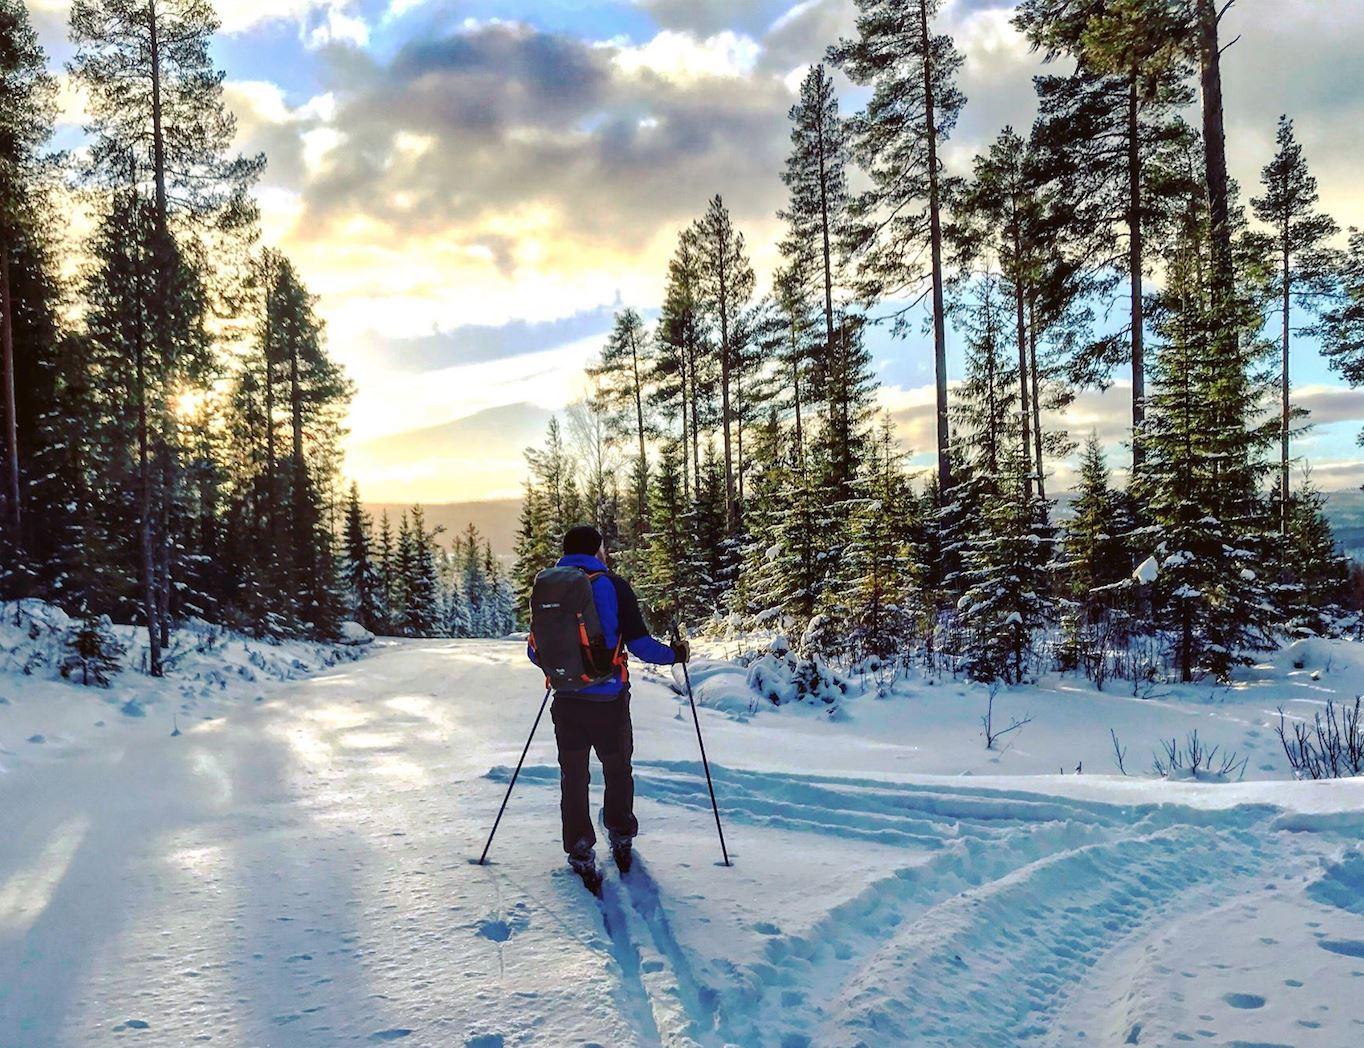 Yogaretreat and touring skis